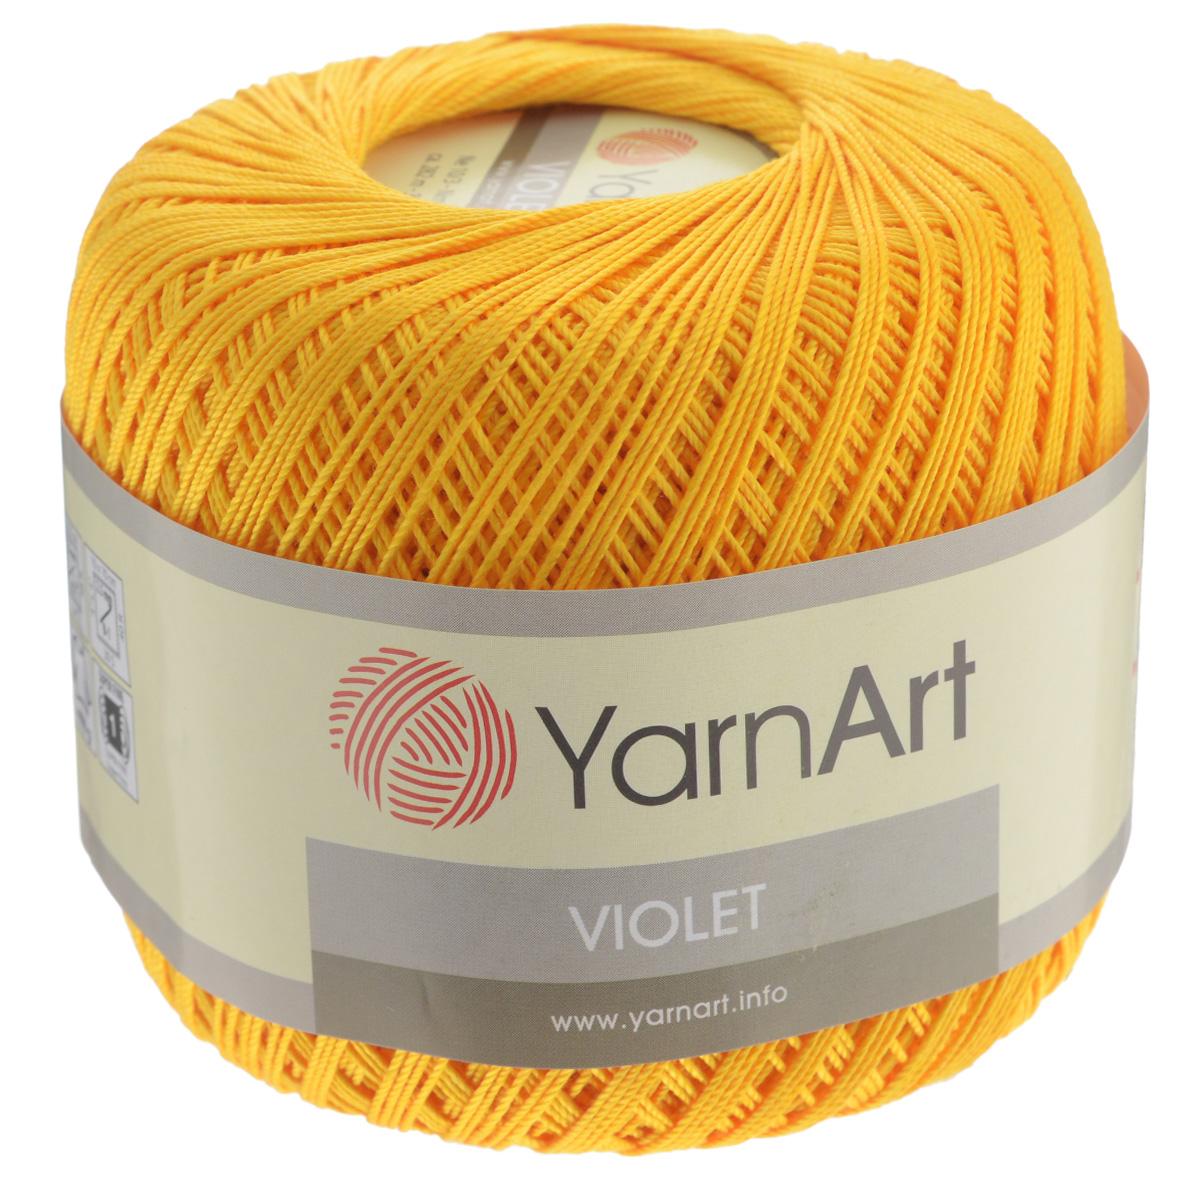 ����� ��� ������� YarnArt Violet, ����: ����-������ (5307), 282 �, 50 �, 6 �� - YarnArt / Yarn Art372018_5307����� ��� ������� YarnArt Violet - ������, ������� � ������� ����� �� 100% ���������������� ������ ��� ������� ������� � �������. ���� ������ �������� � �� �������������. ��� ������������ �����, ������� ���������� ������� �������������. ������� �������� ��� ������� ������� �������. ������������� ������� ��� ������� � ������� ����������� �������. ������������� ��� ������� �� ������ � ������ 2,5 ��. ������: 100% ������.